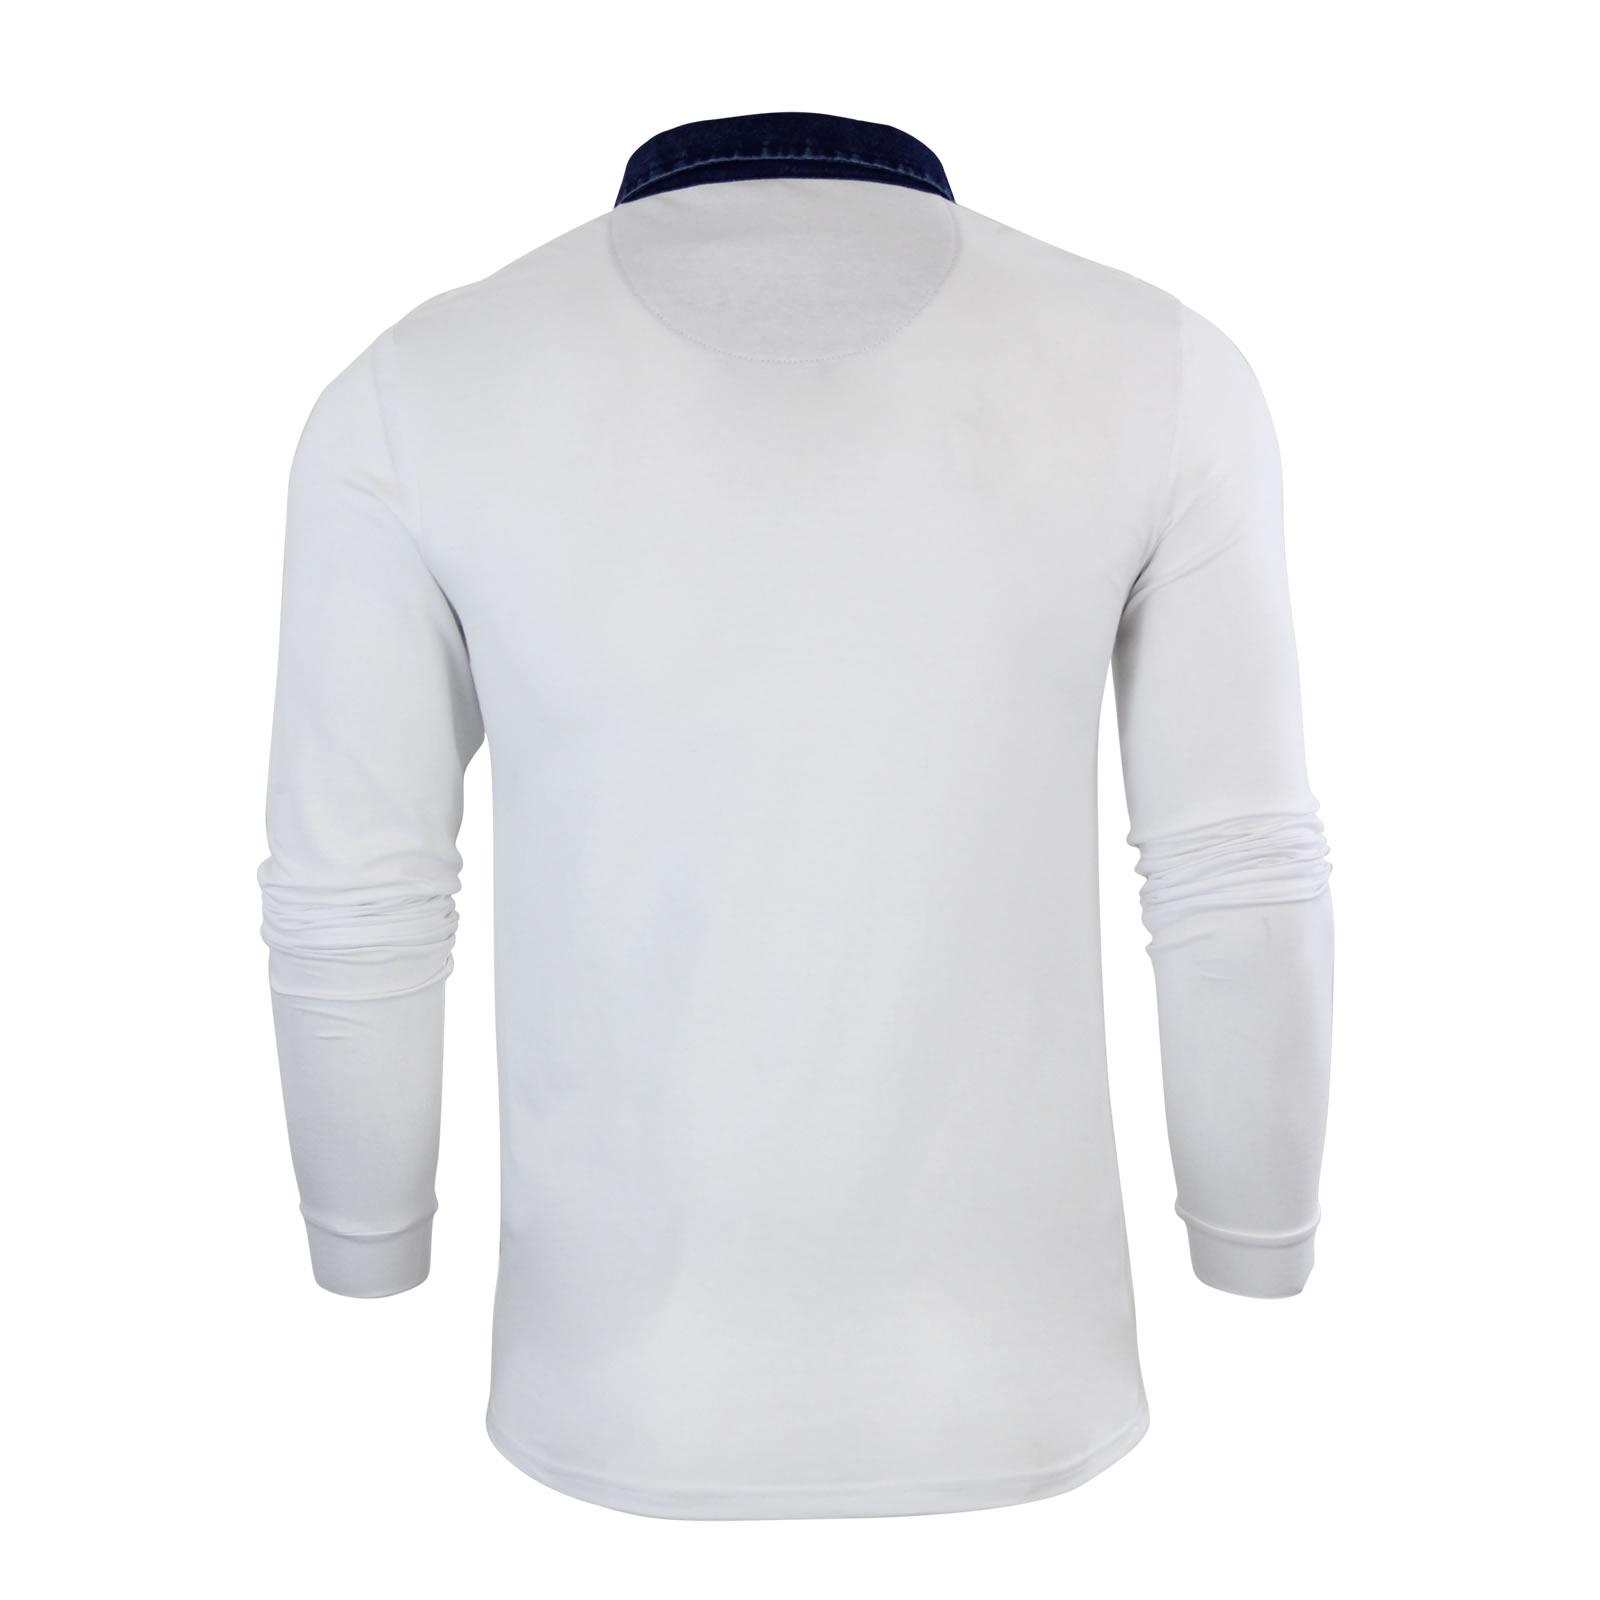 Mens-Polo-T-Shirt-Brave-Soul-Gospel-Denim-Collared-Long-Sleeve-Casual-Top thumbnail 9